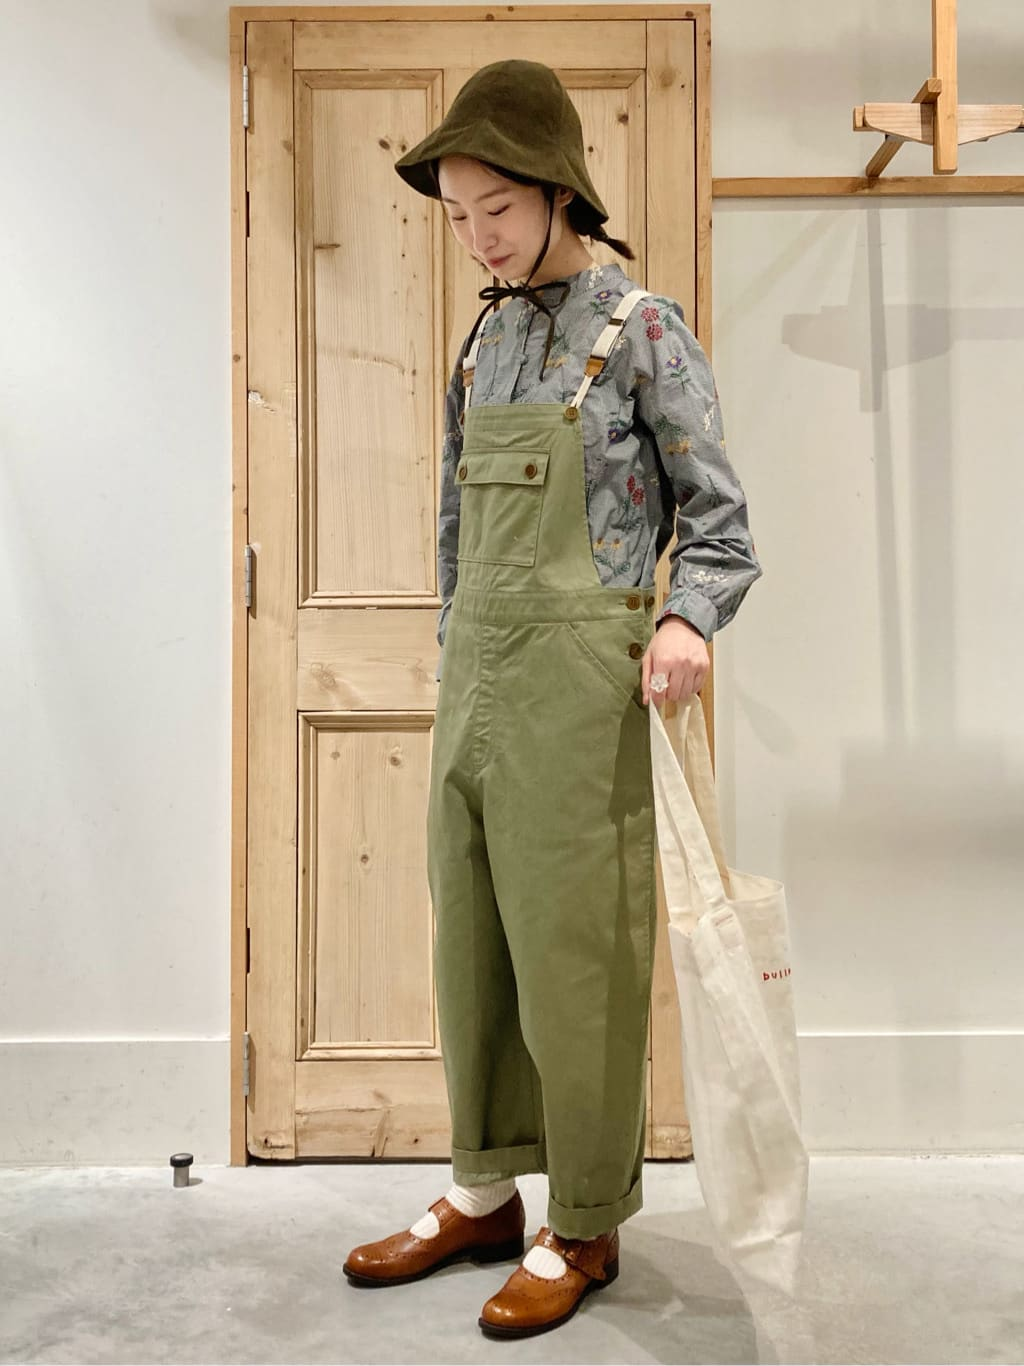 Malle chambre de charme 調布パルコ 身長:162cm 2021.09.15